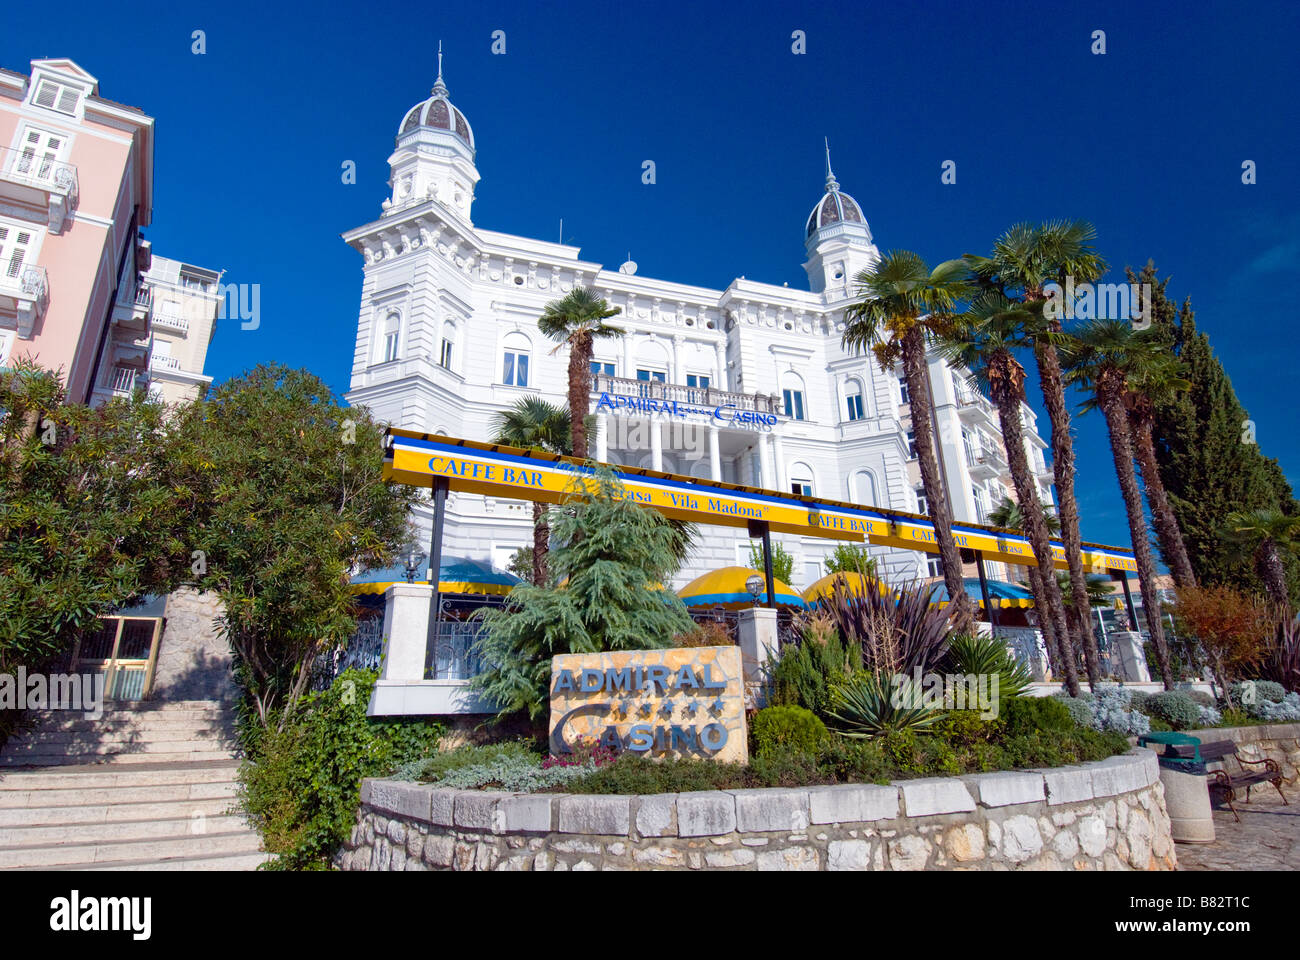 Exterior architecture of the Admiral Casino in Opatija Croatia Stock Photo